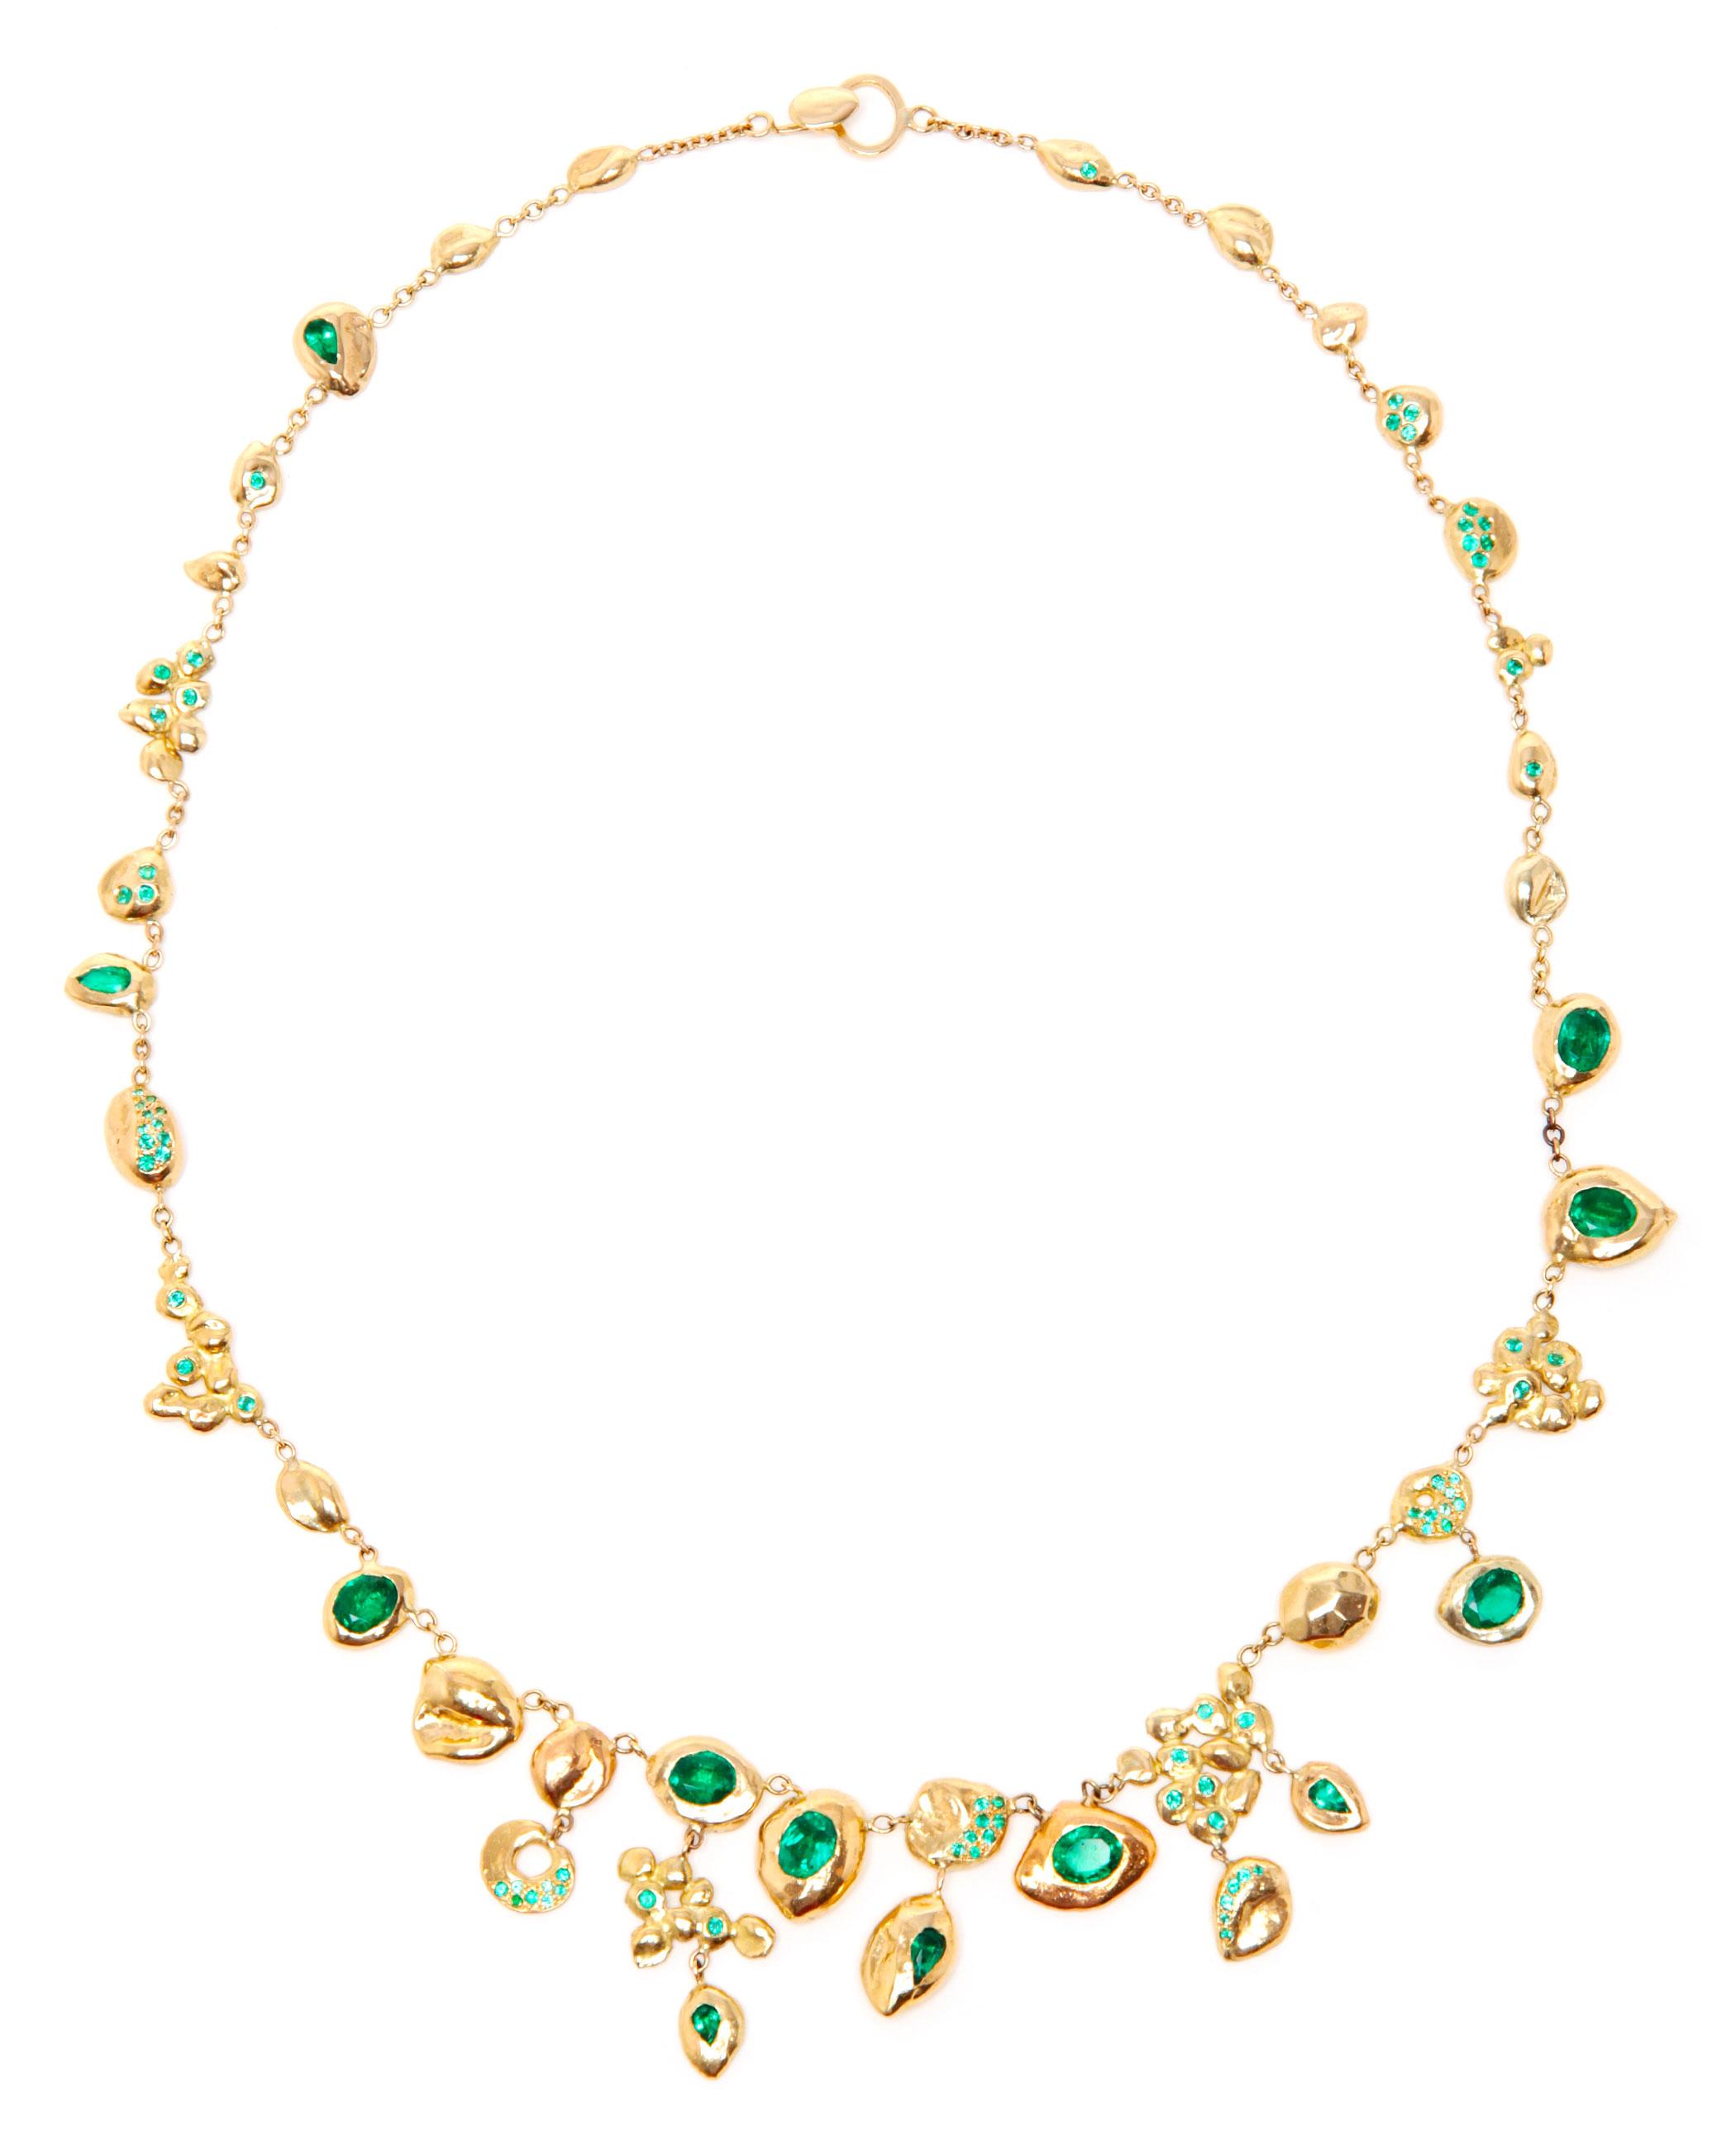 Gemfields Collaboration Emerald Necklace